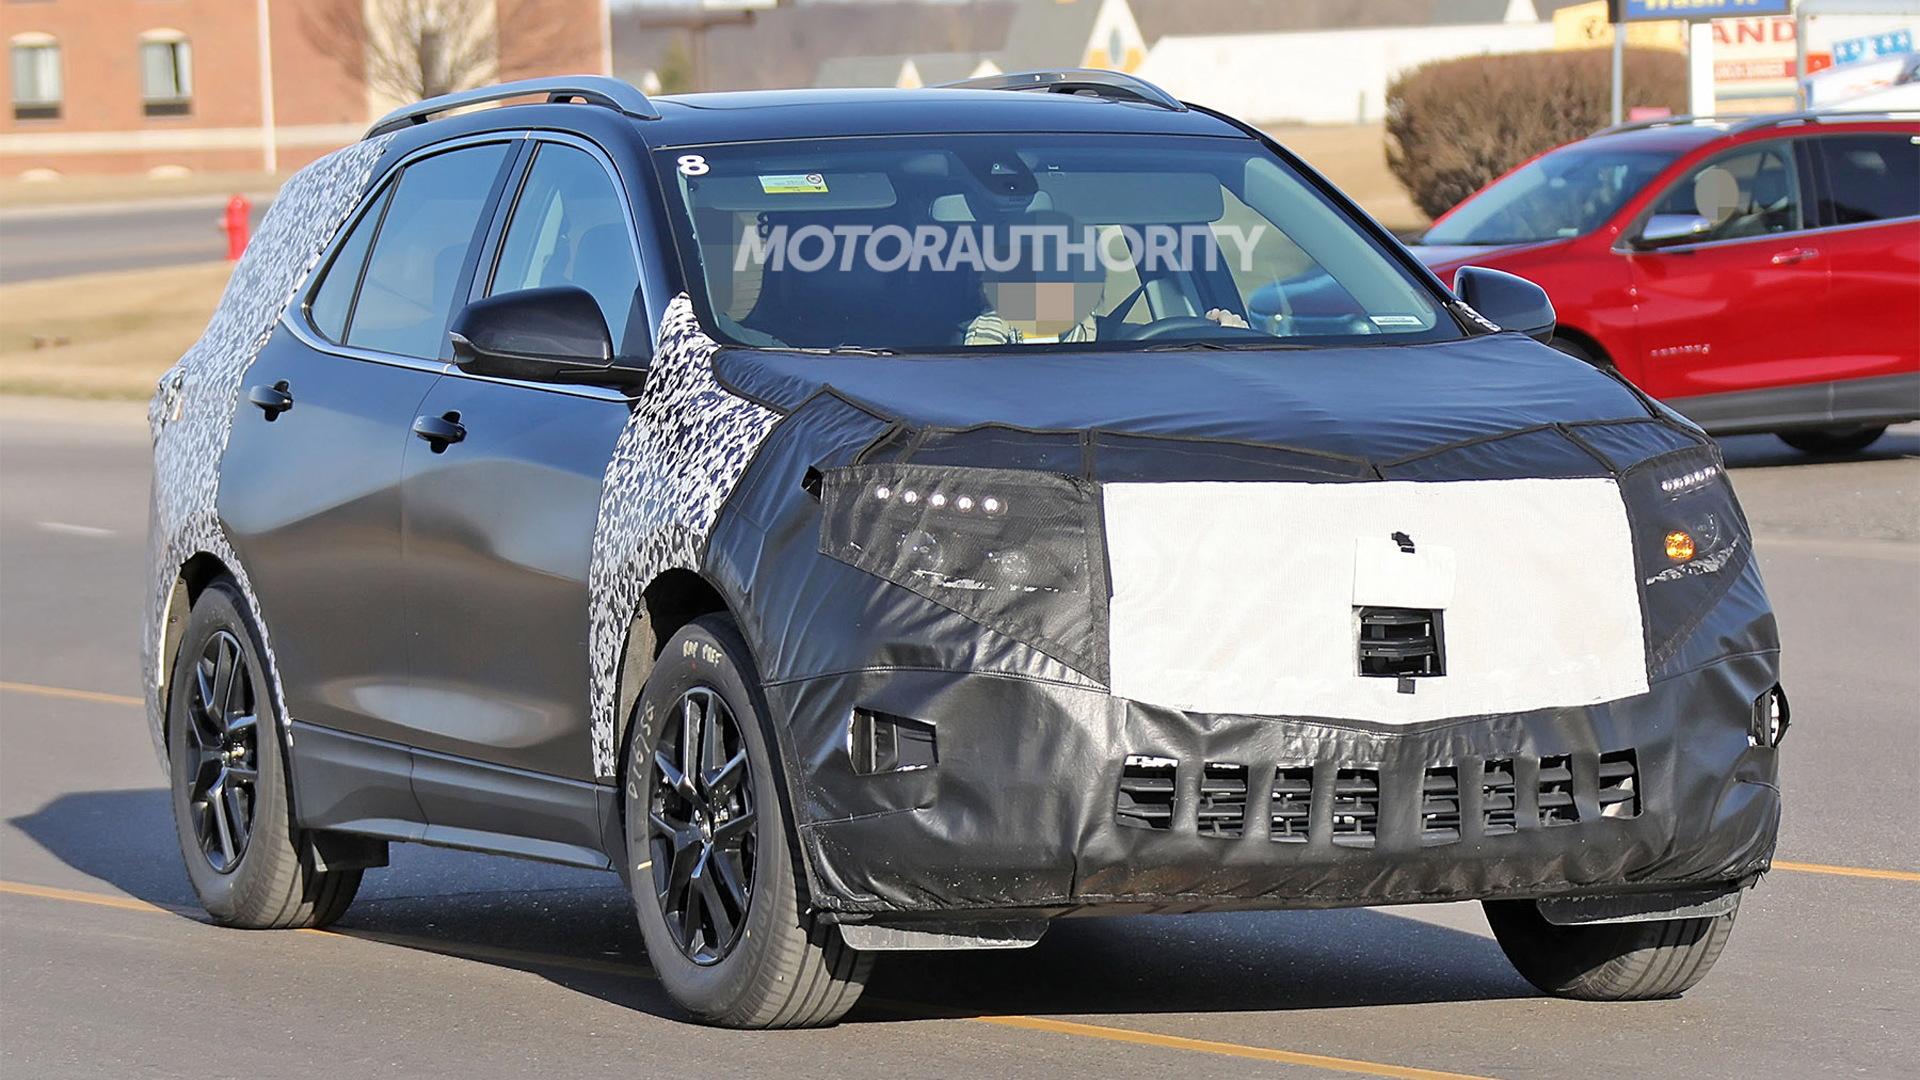 2020 Chevrolet Equinox facelift spy shots - Image via S. Baldauf/SB-Medien